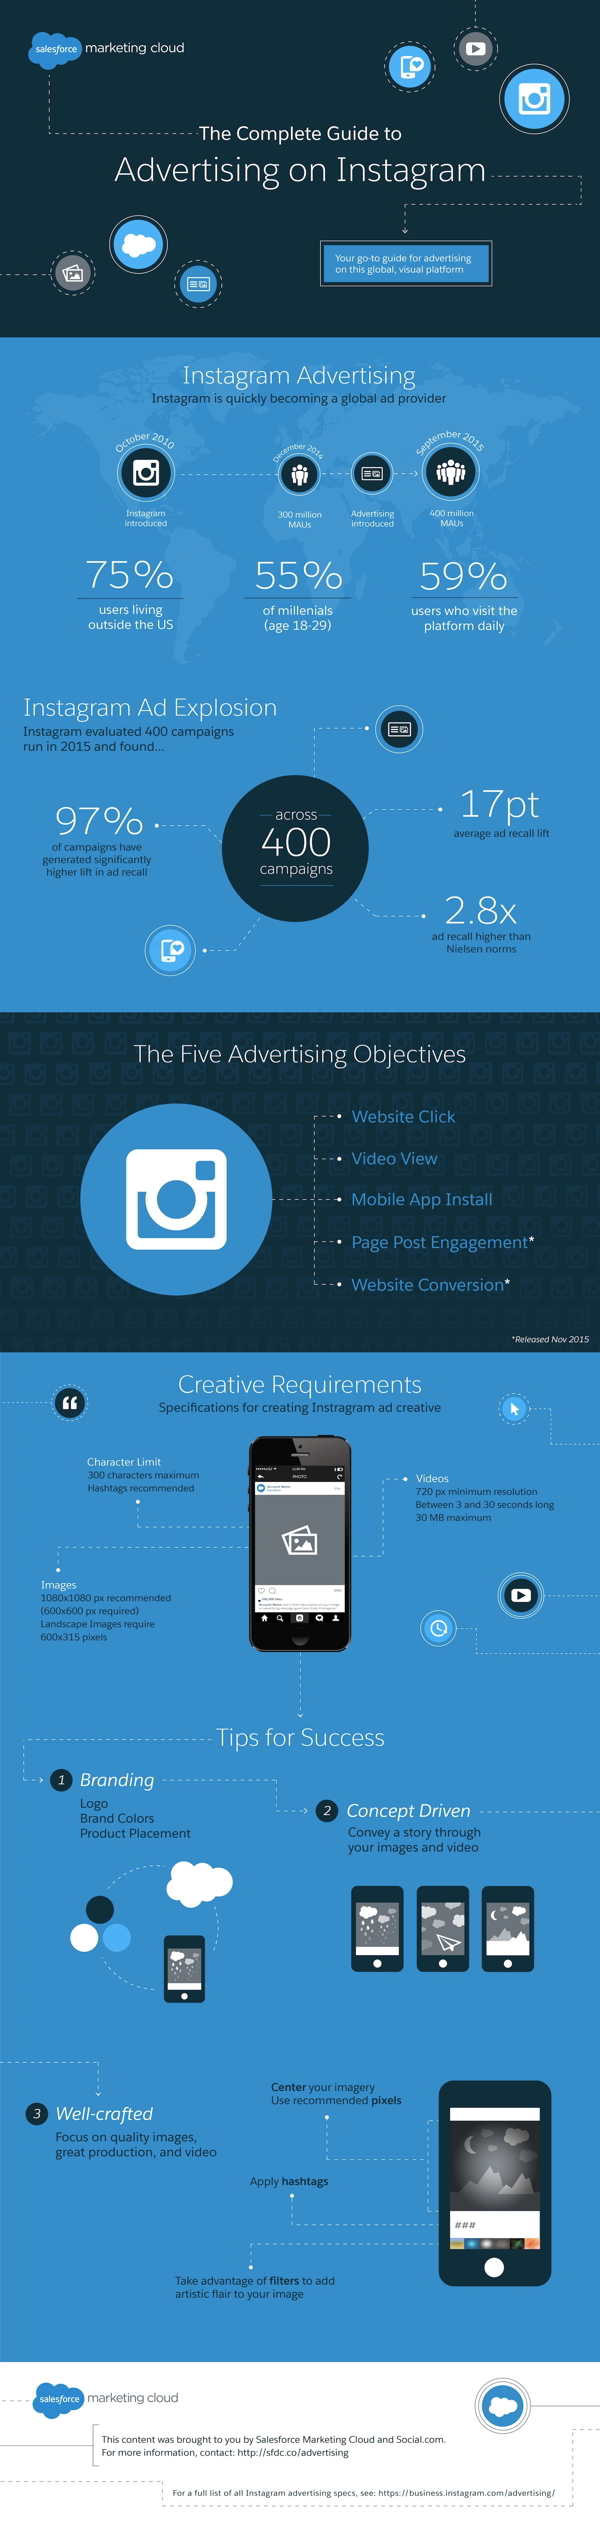 Aumenta tus ventas con Instagram #infografia